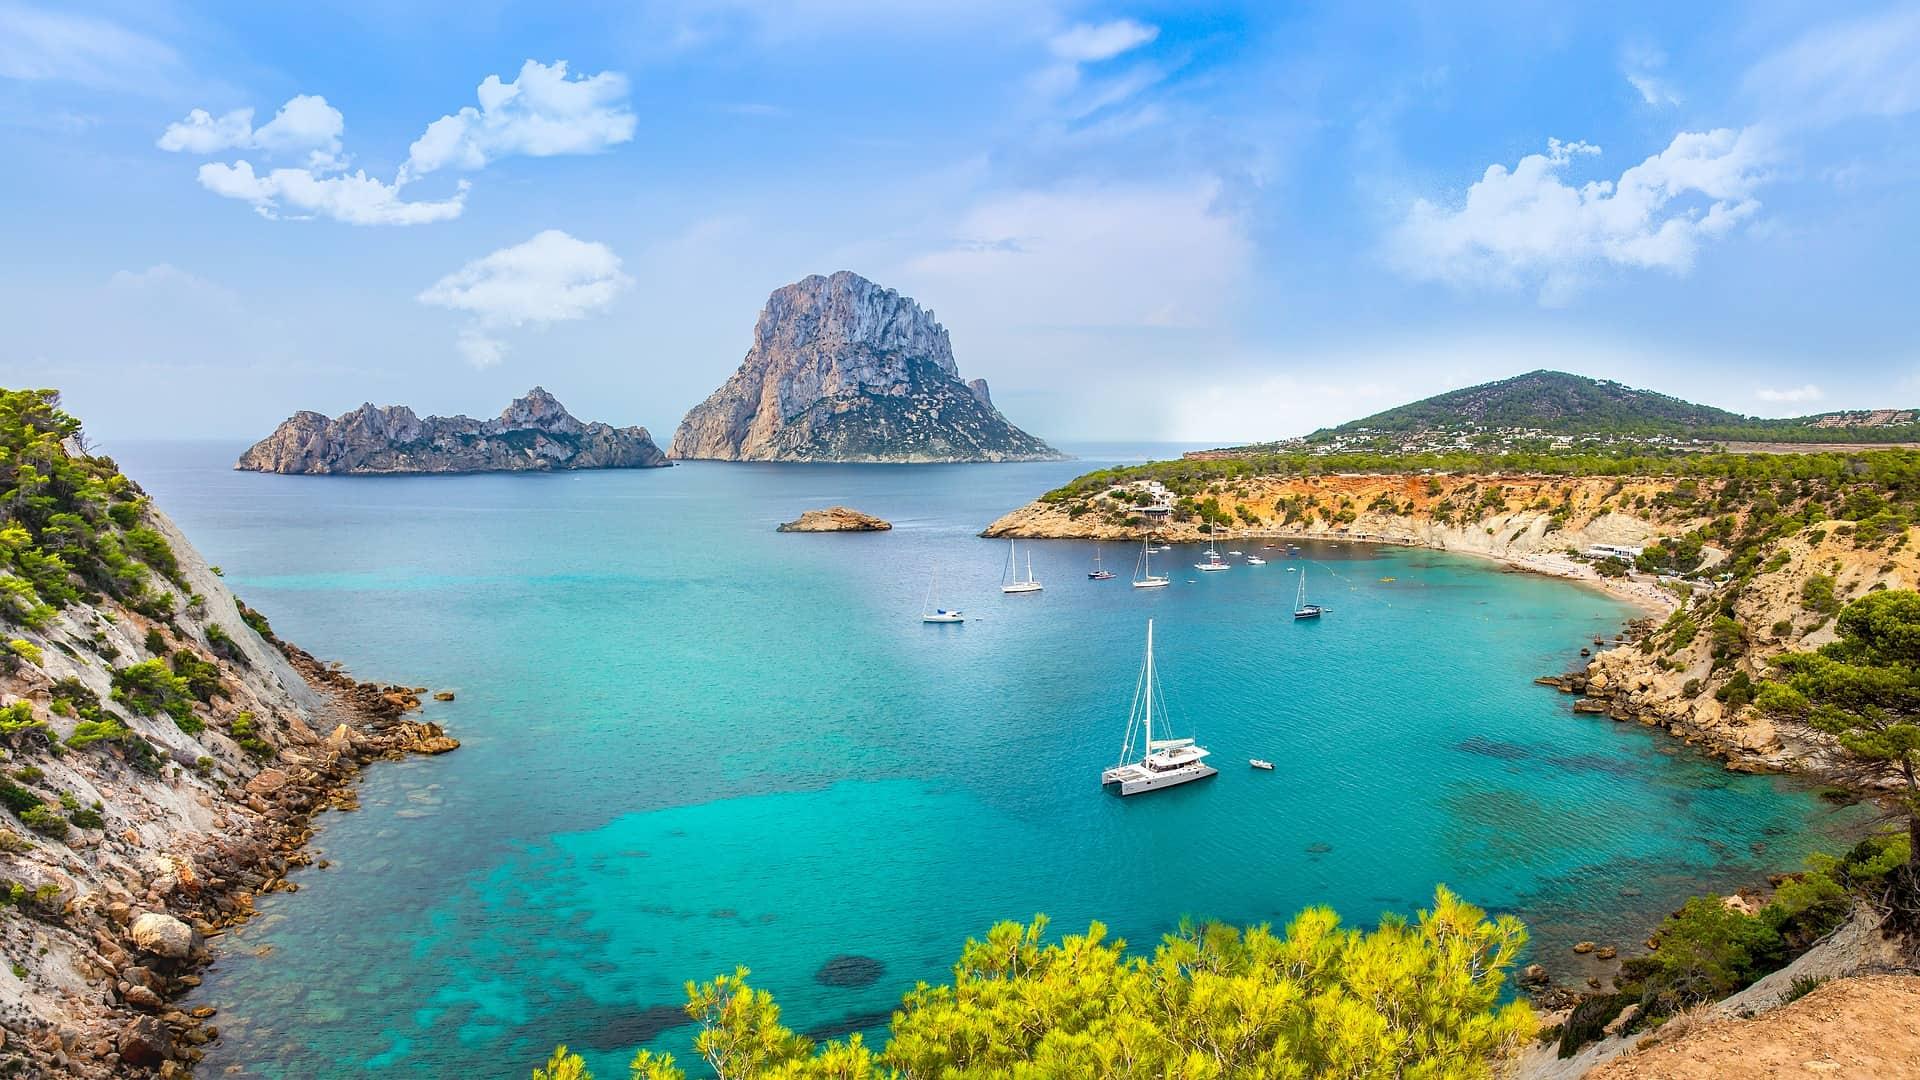 Ibiza Flüge - Sommerferien 71% günstiger Hin & Rückflug nur 95,76€